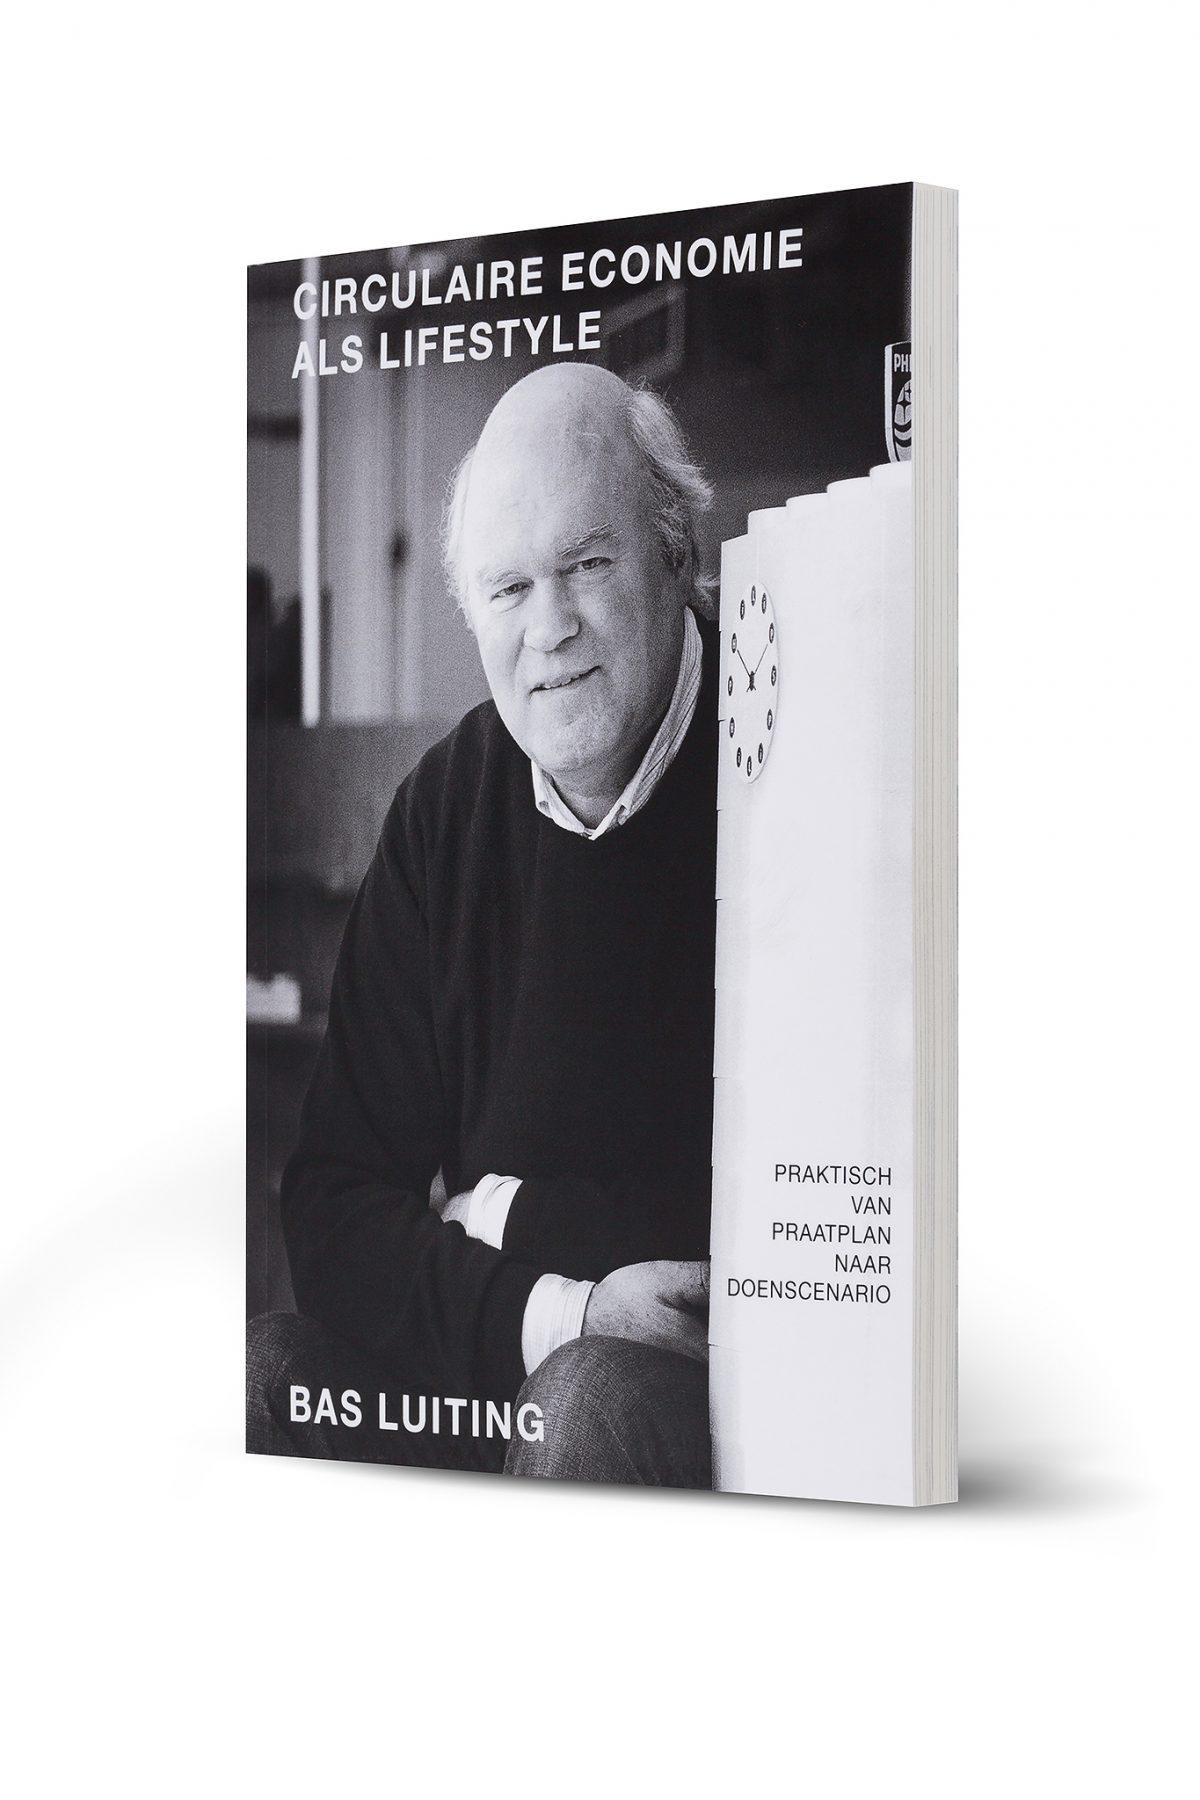 Boek: circulaire economie als lifestyle